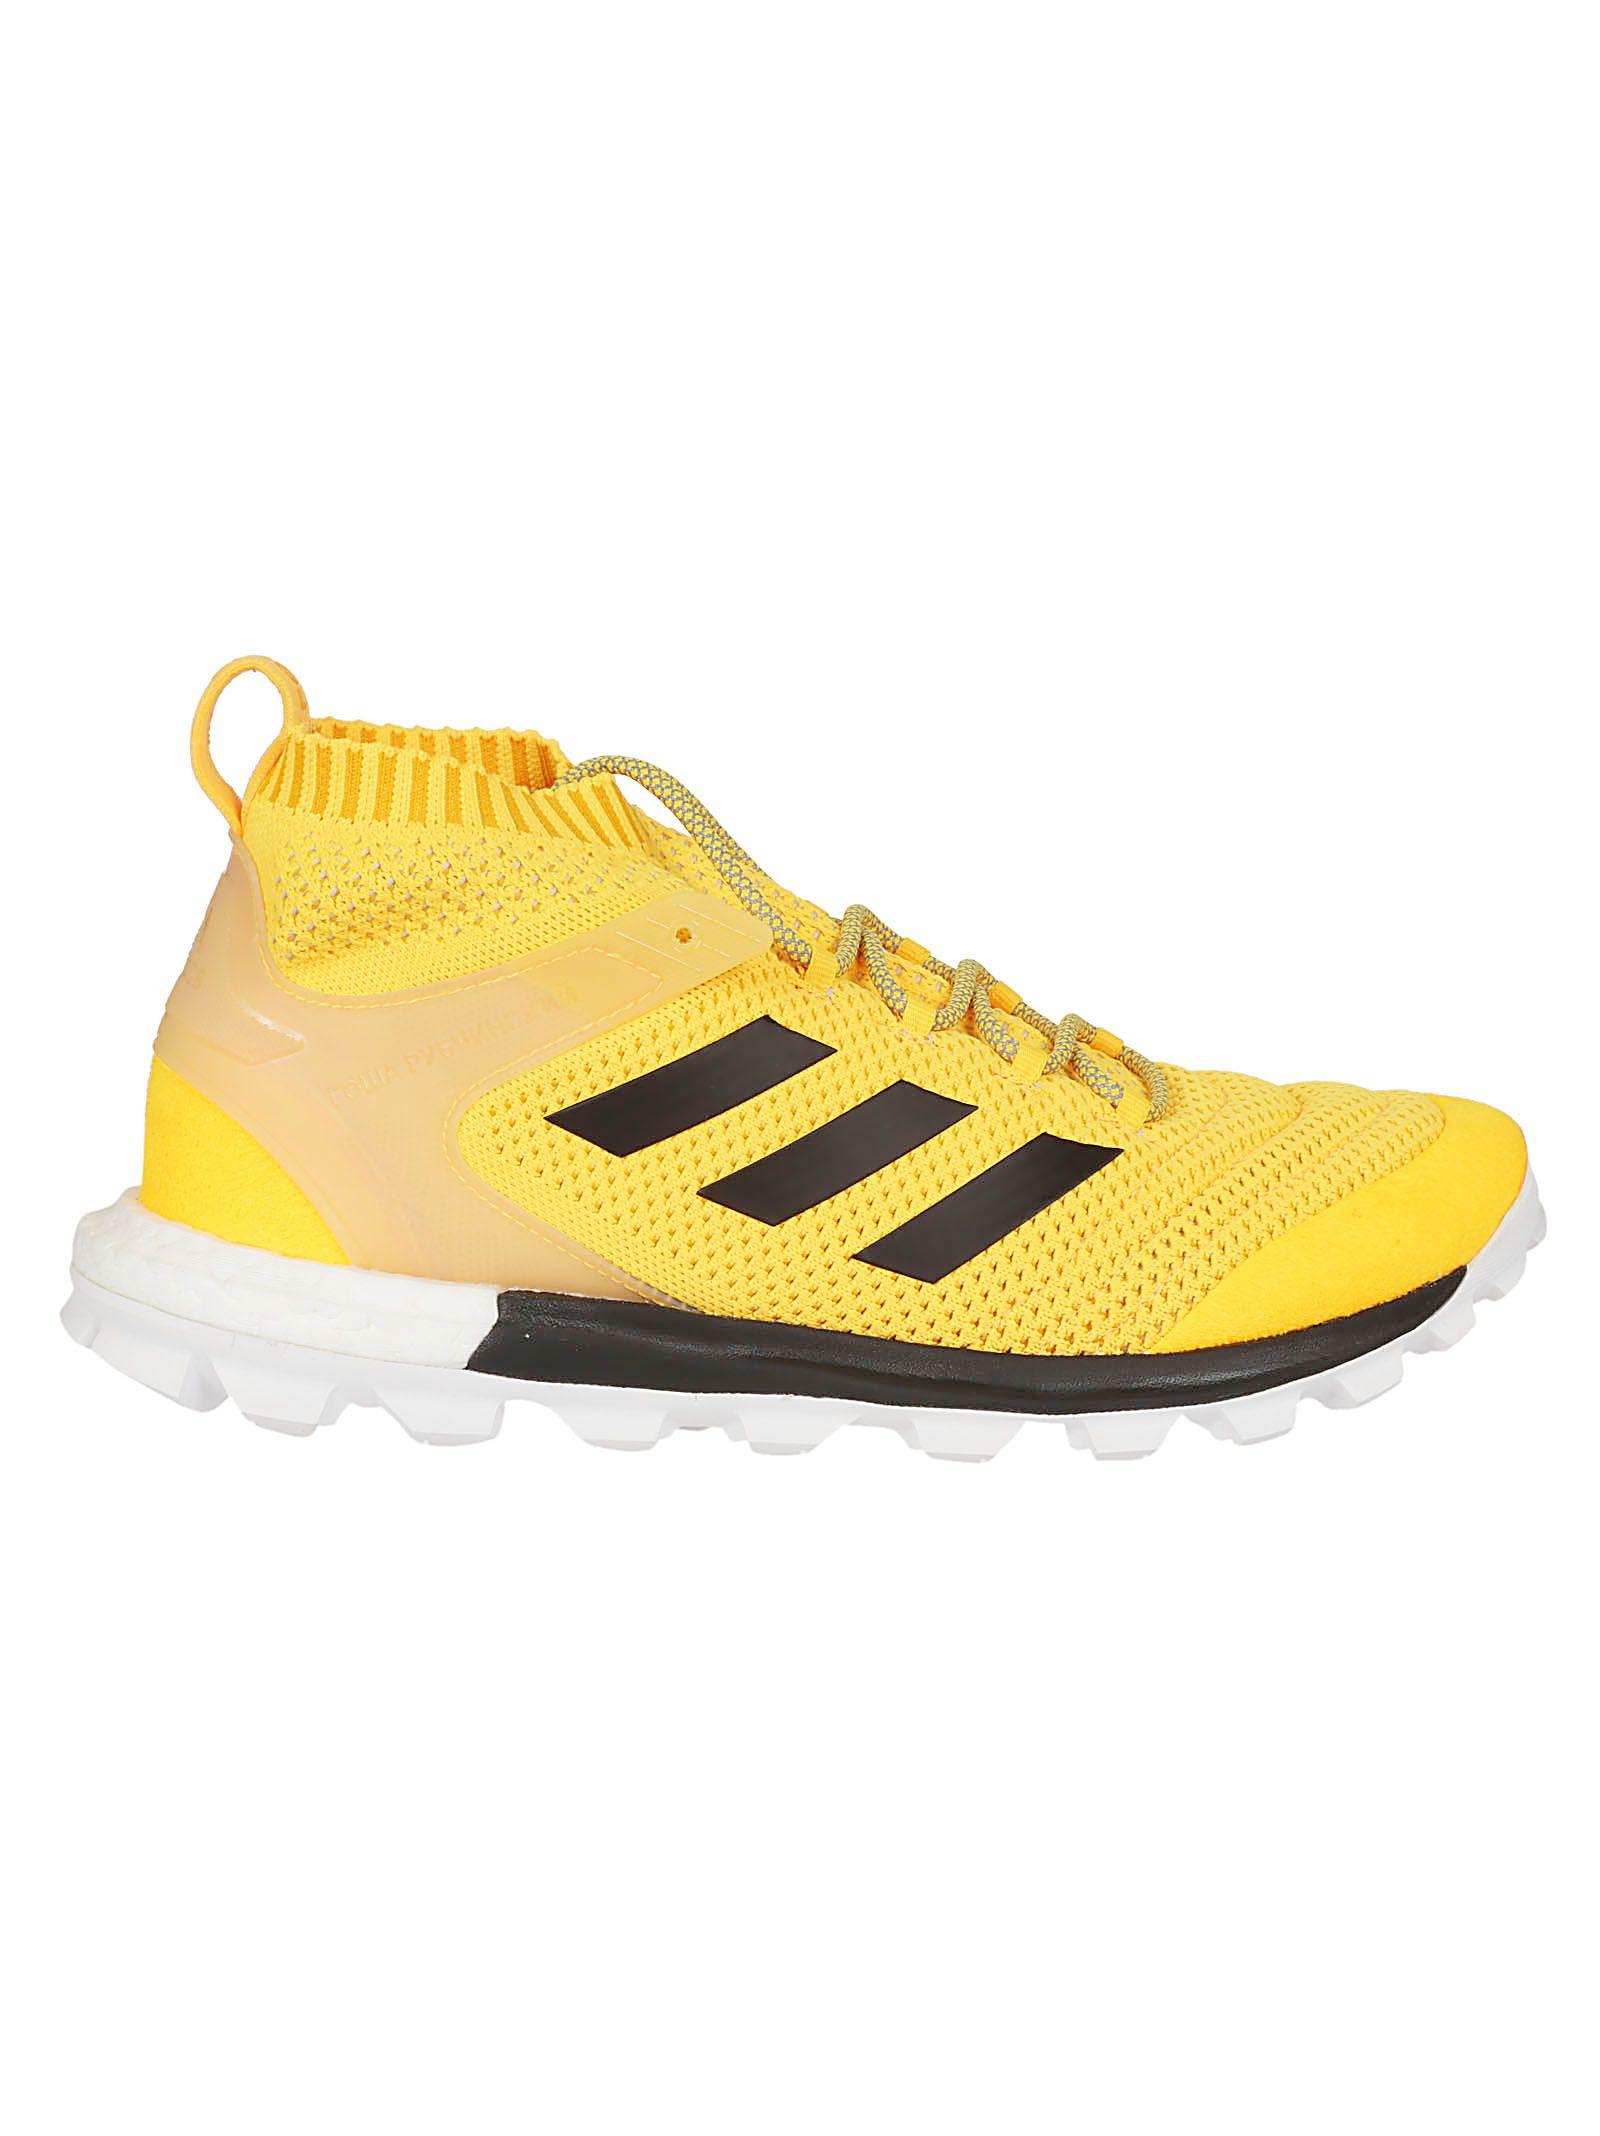 outlet store 2e856 387d4 GOSHA RUBCHINSKIY Gosha Rubchinskiy X Adidas网眼运动鞋. gosharubchinskiy shoes